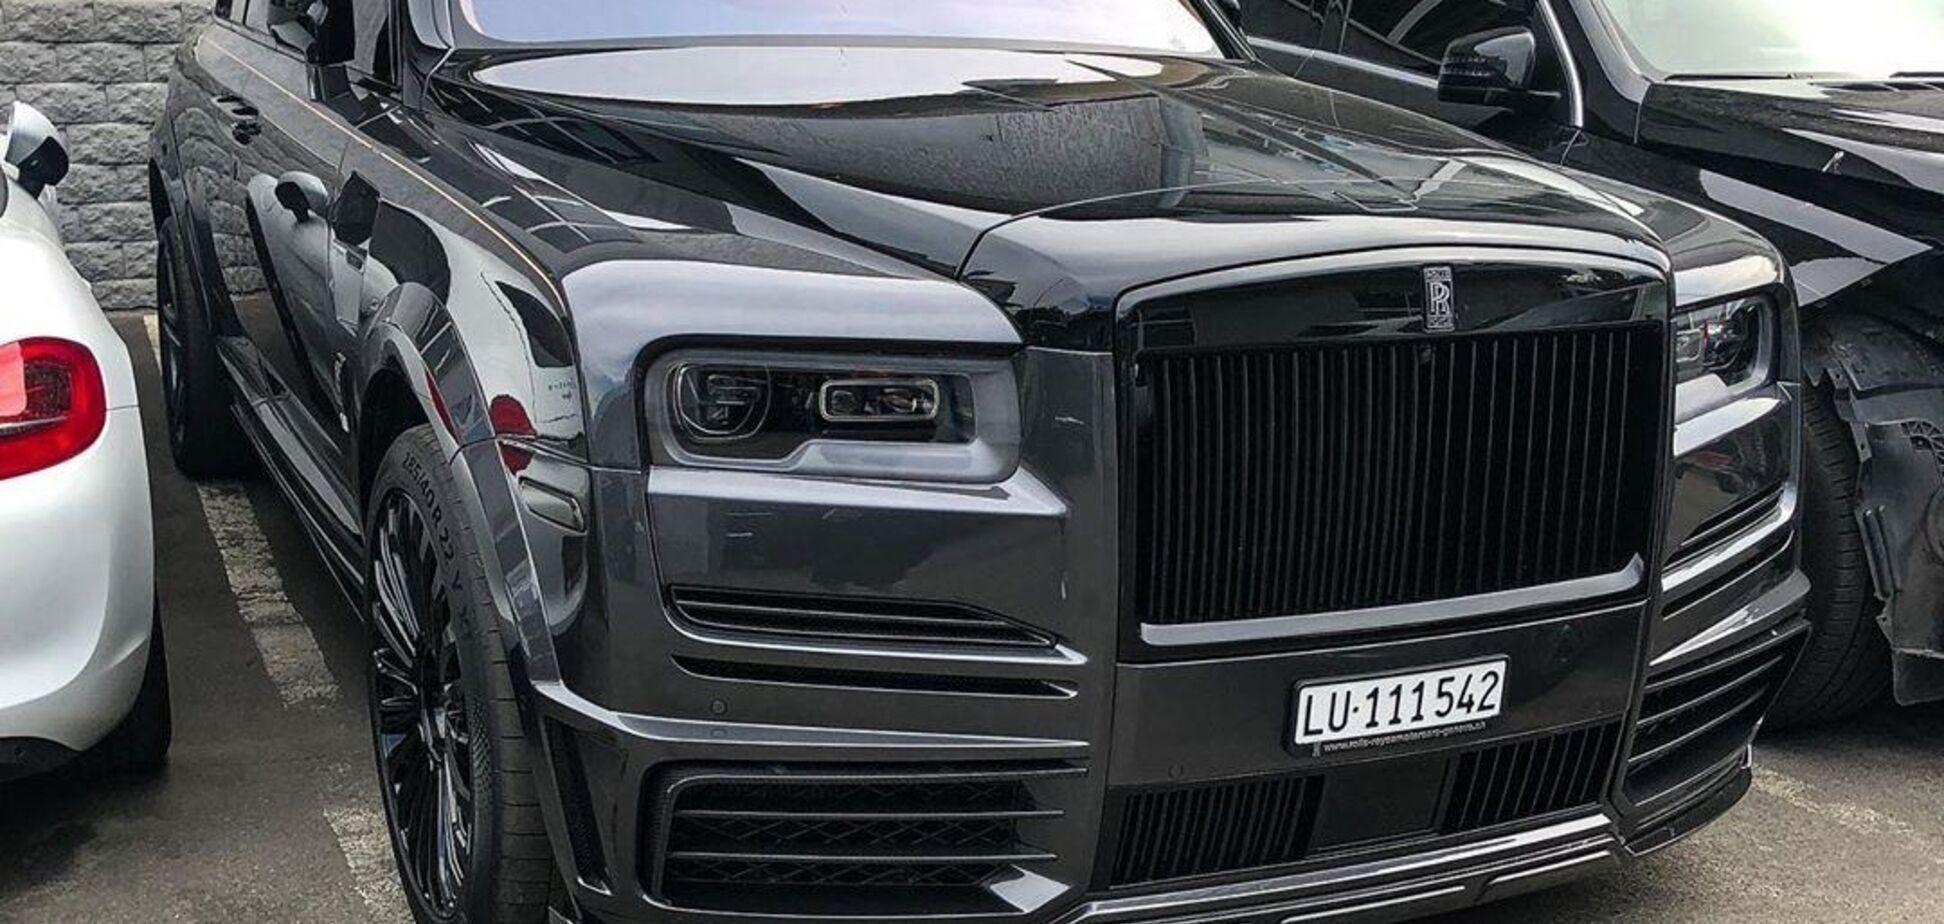 В Україні знайшли найдорожчий Rolls-Royce Cullinan. Фото: instagram.com/vehicles.exclusive